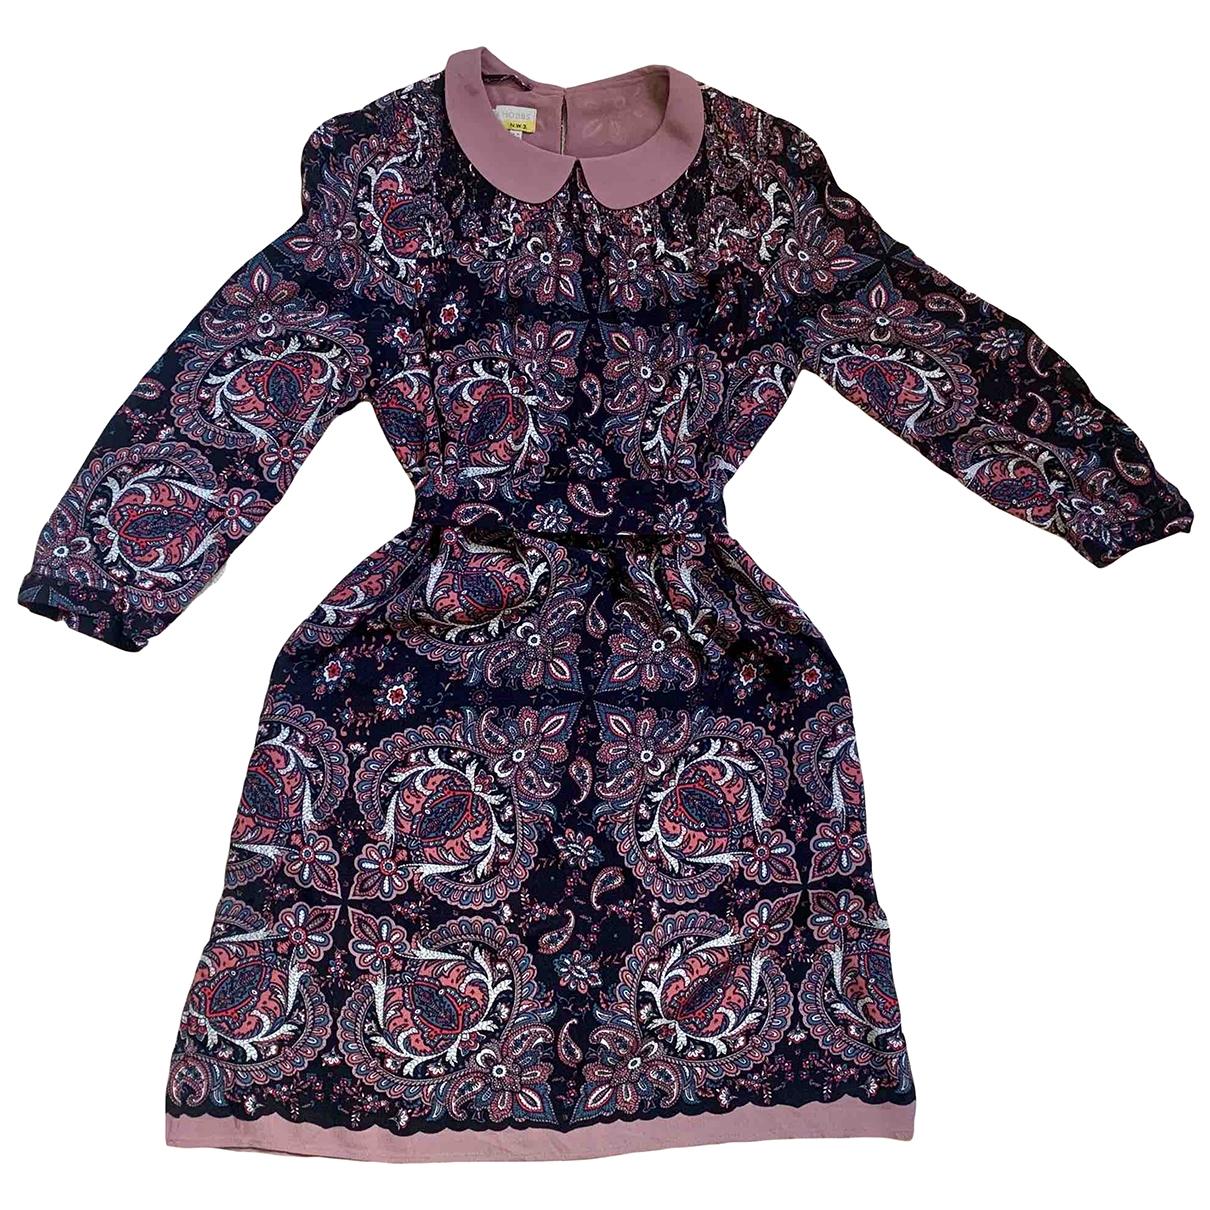 Hobbs N.w.3 - Robe   pour femme - multicolore